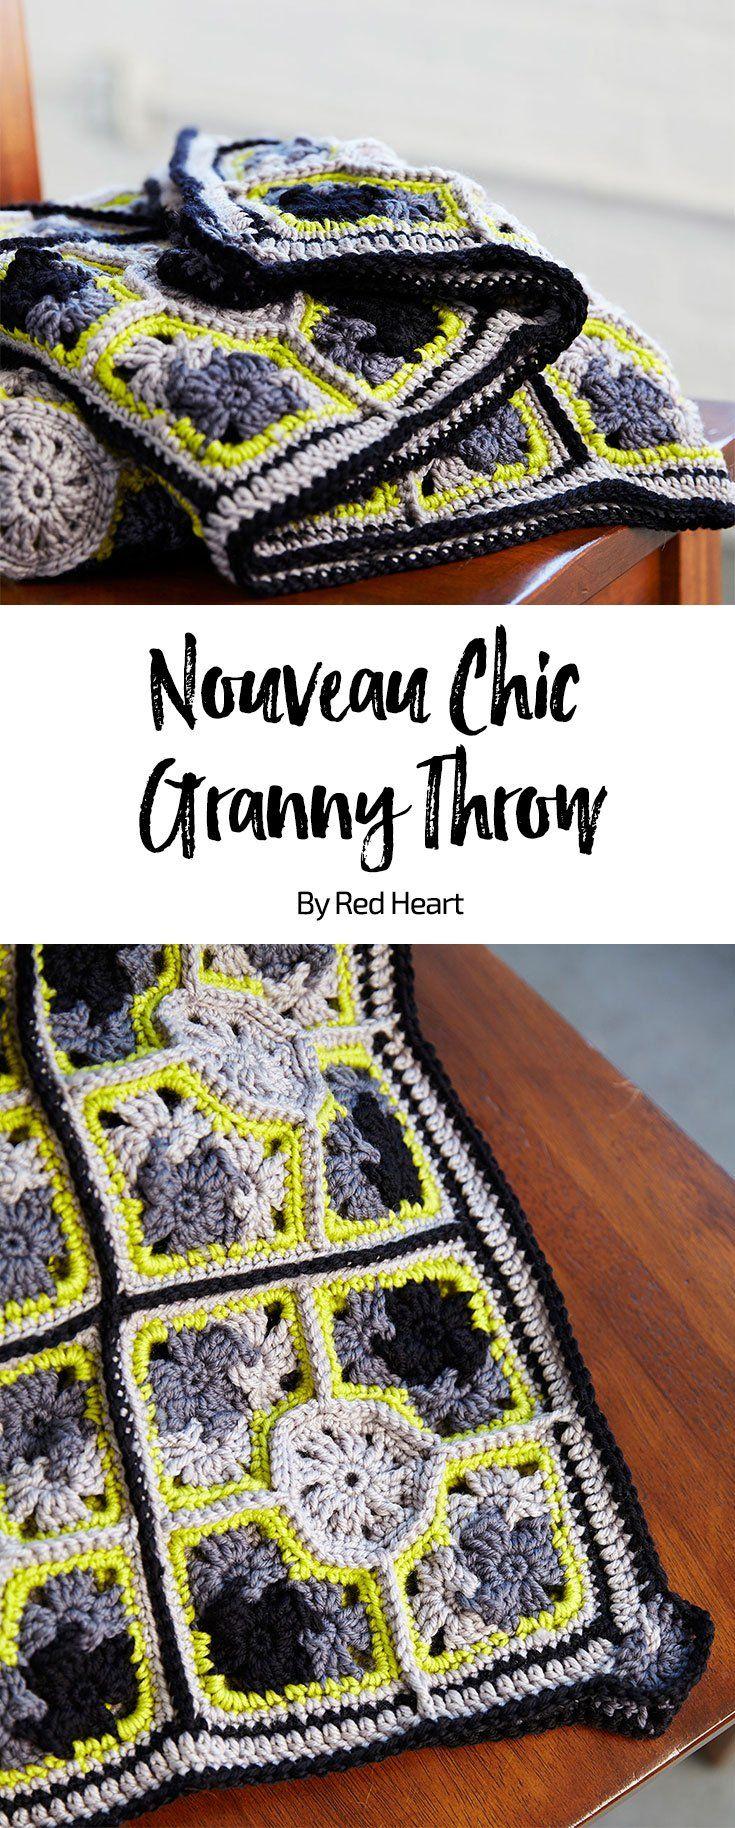 Nouveau Chic Granny Throw Free Crochet Pattern In Chic Sheep Merino